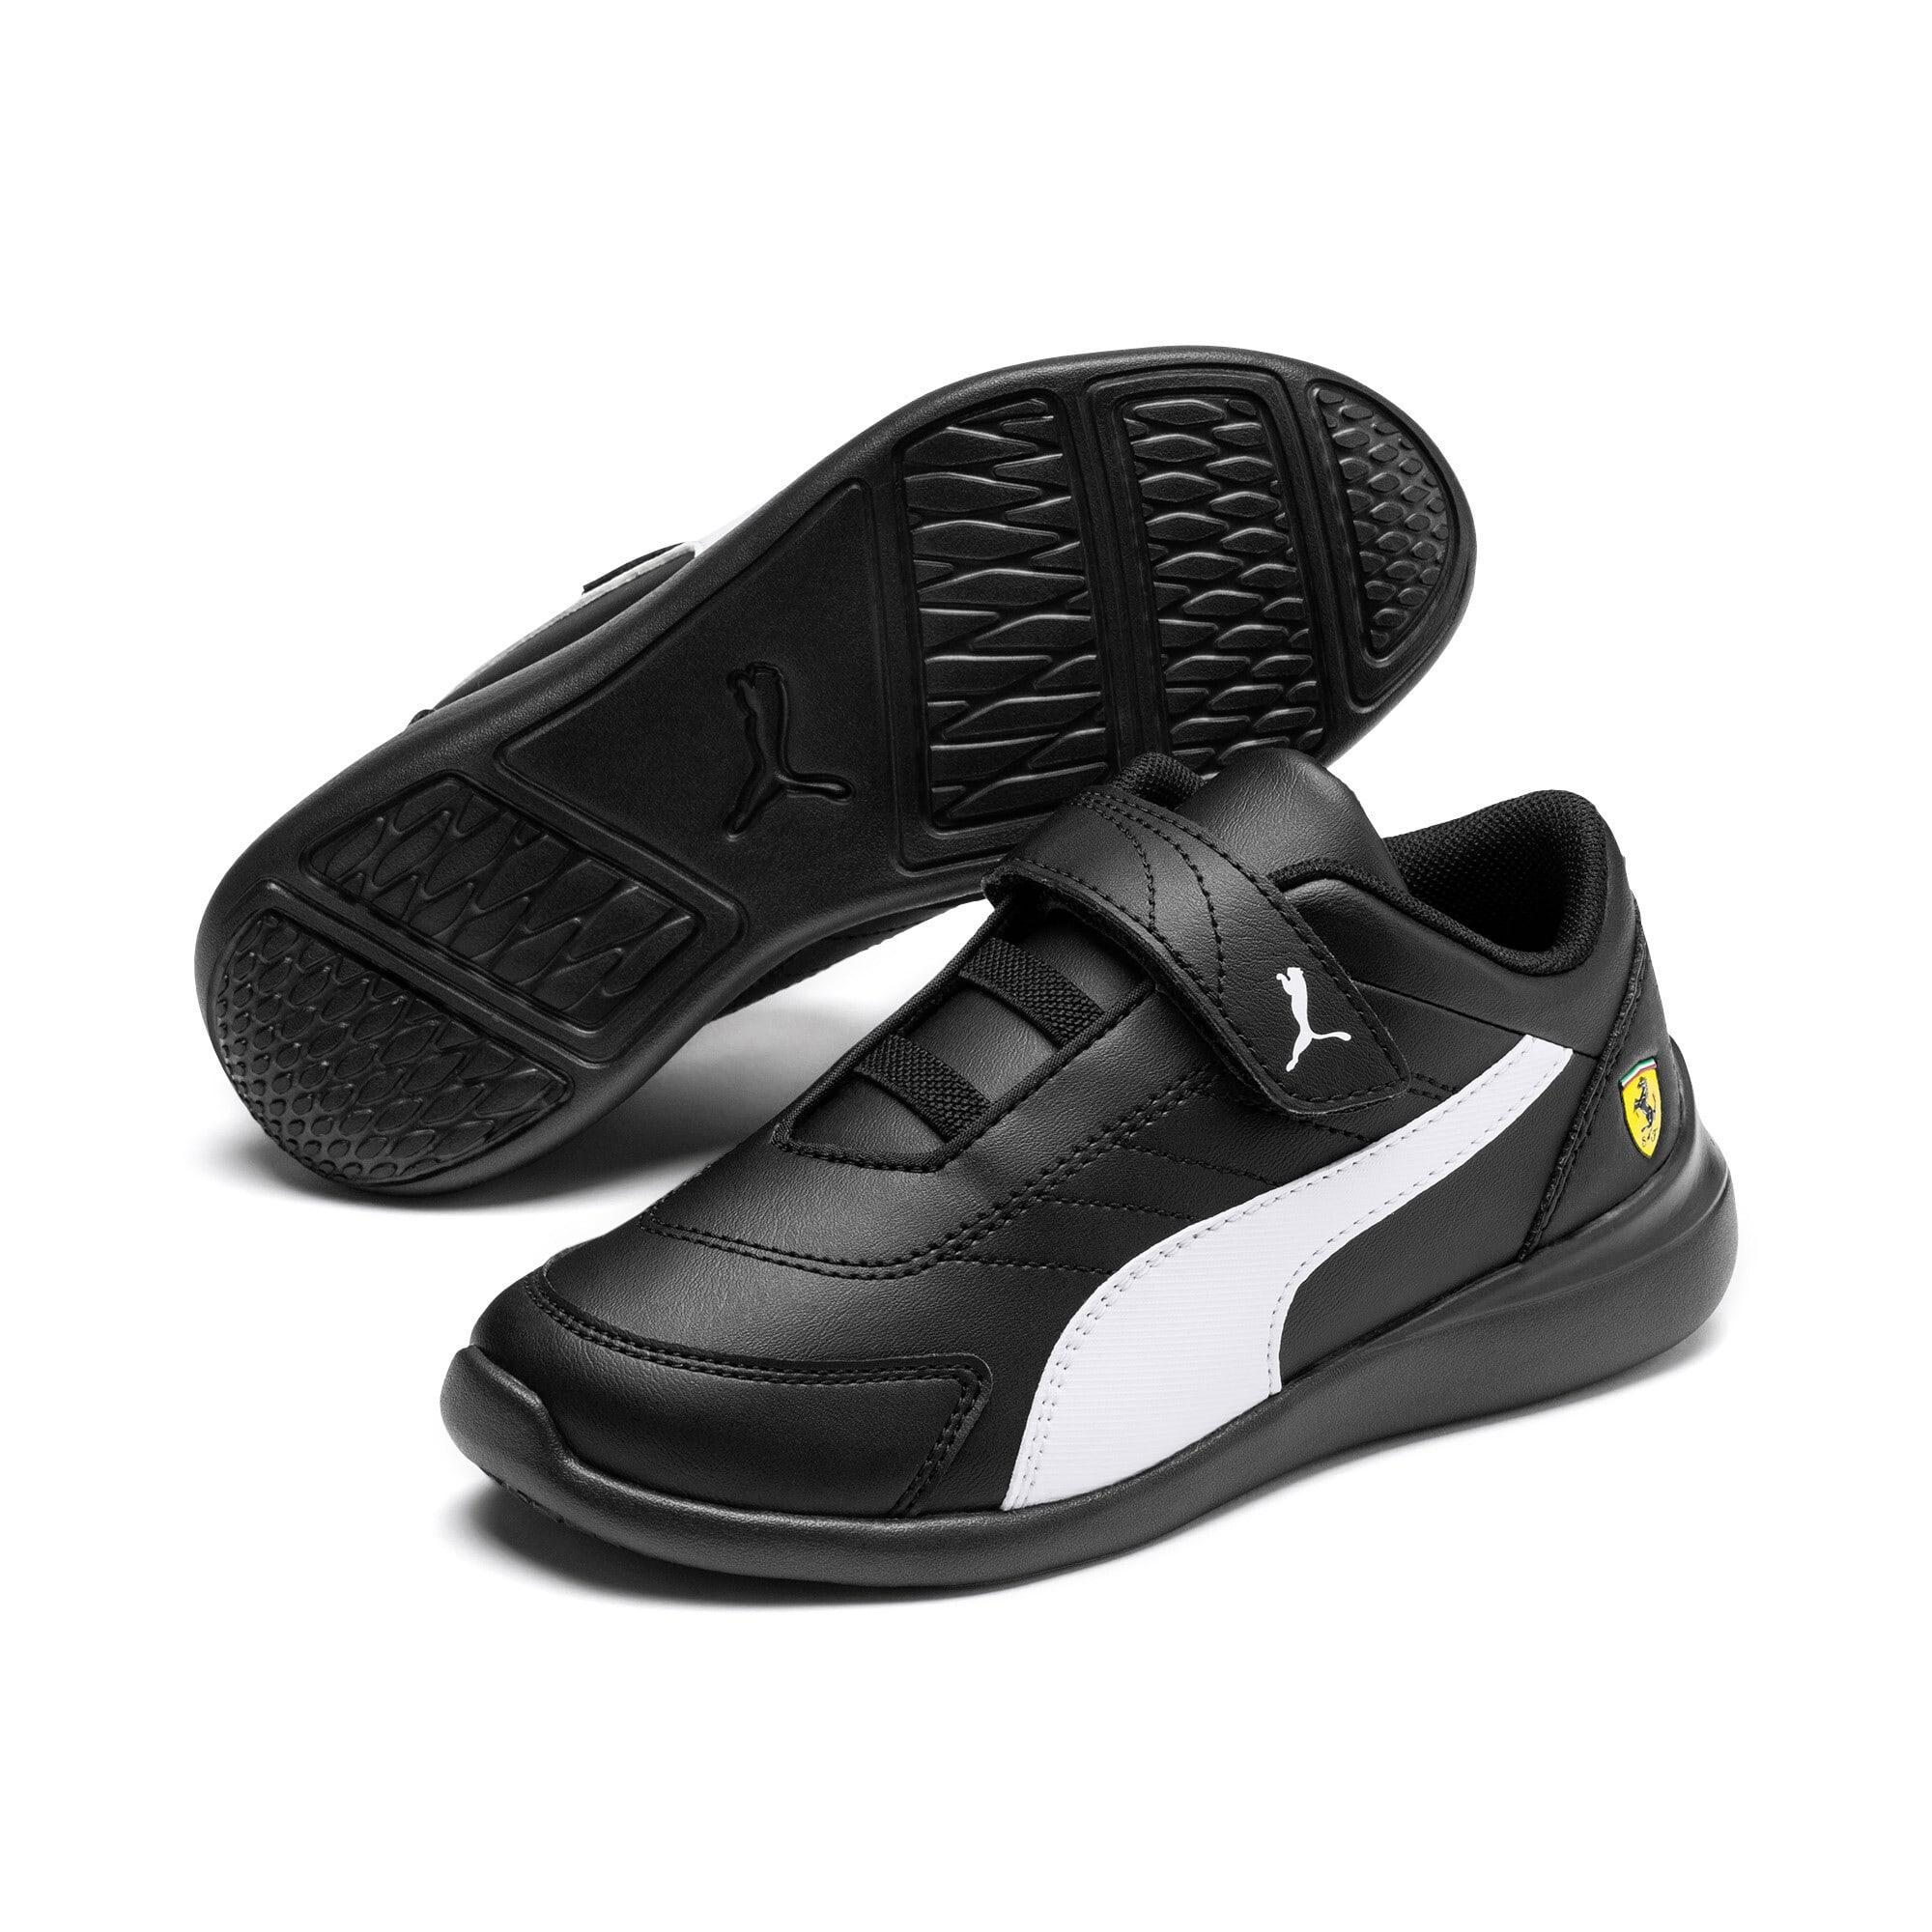 Thumbnail 2 of Ferrari Kart Cat III Kids Sneaker, Black-White-Blazing Yellow, medium